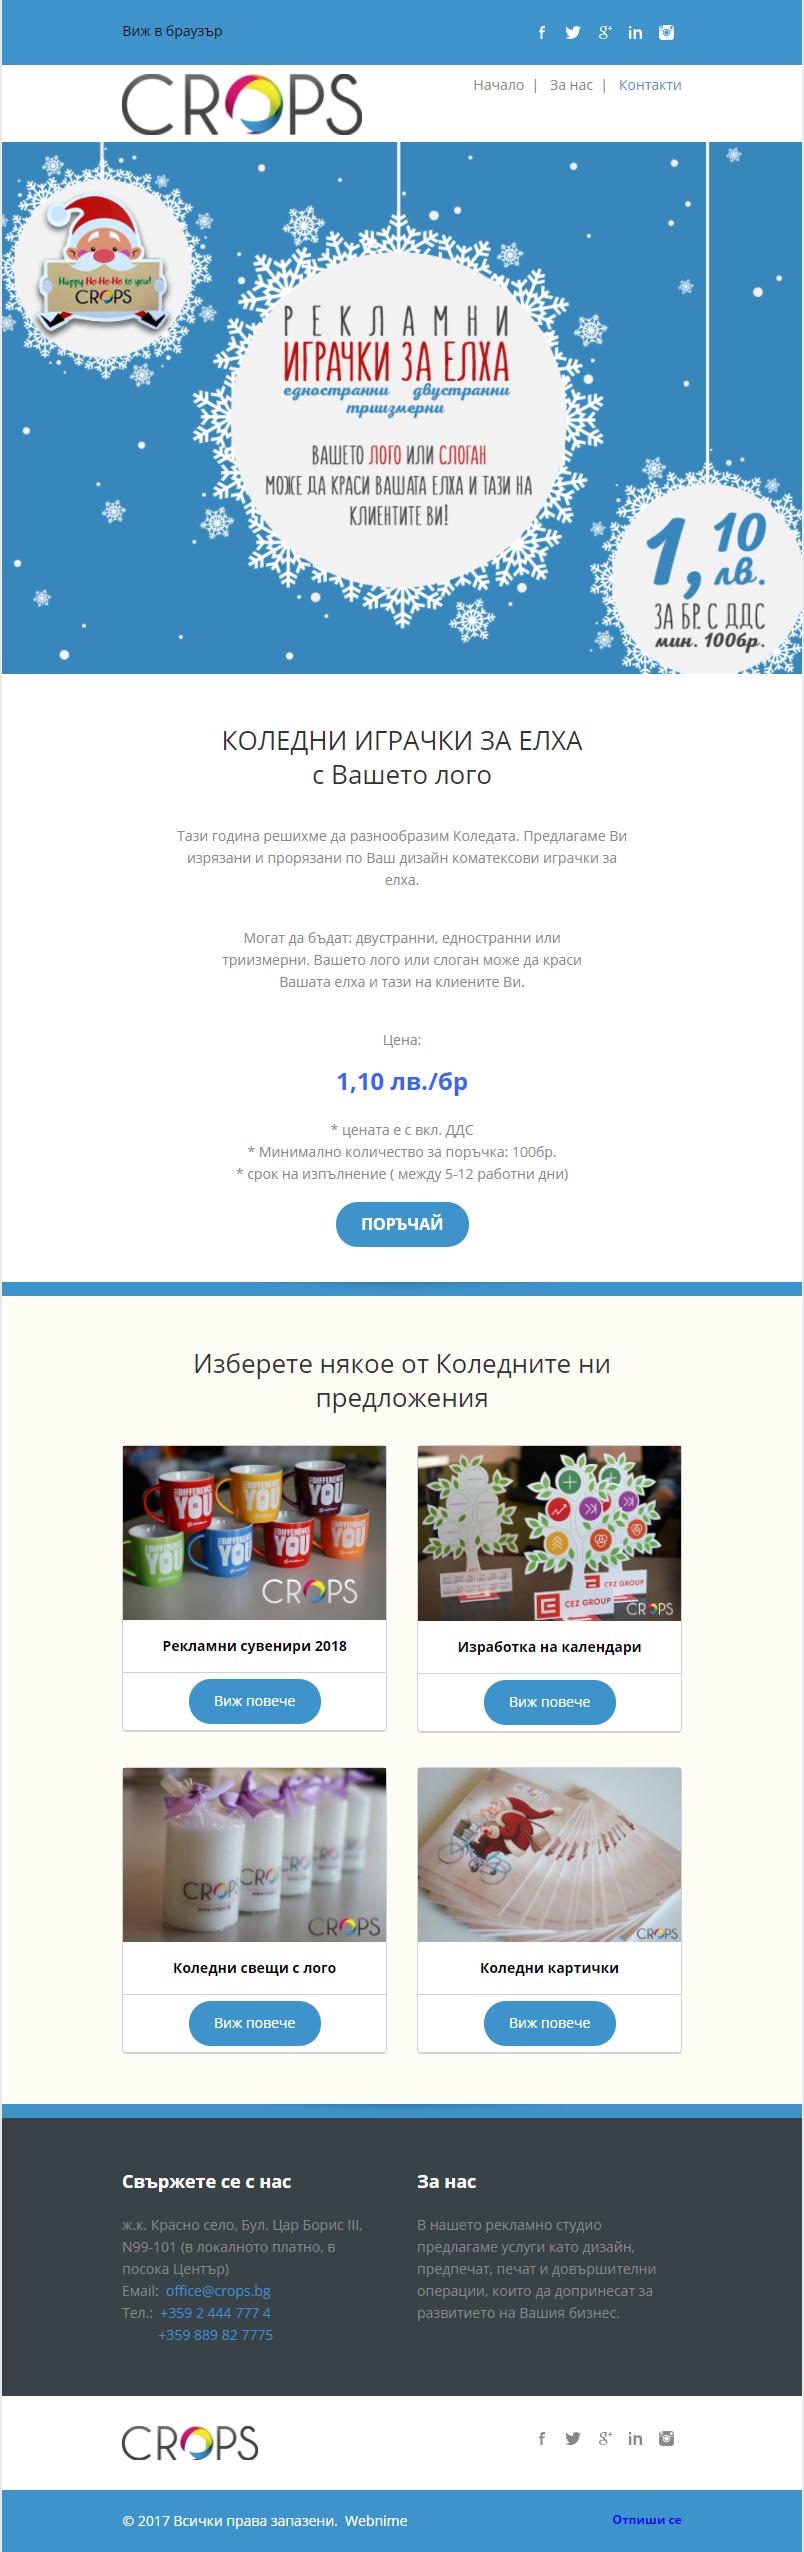 Email Marketing - Božićne igračke